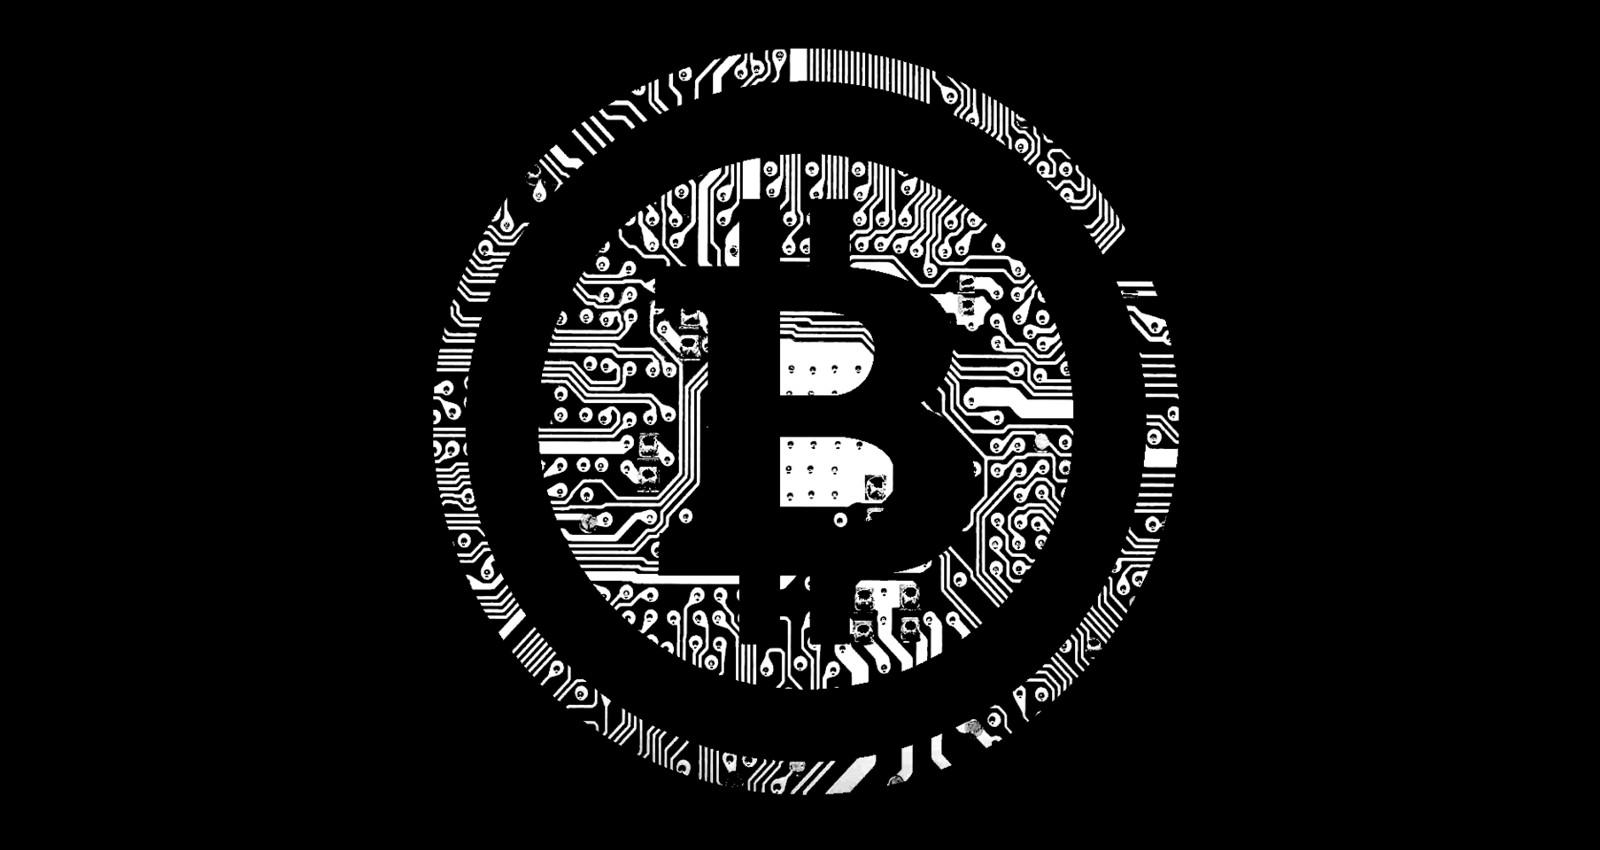 Bitcoin mixen: So lassen sich Bitcoins waschen